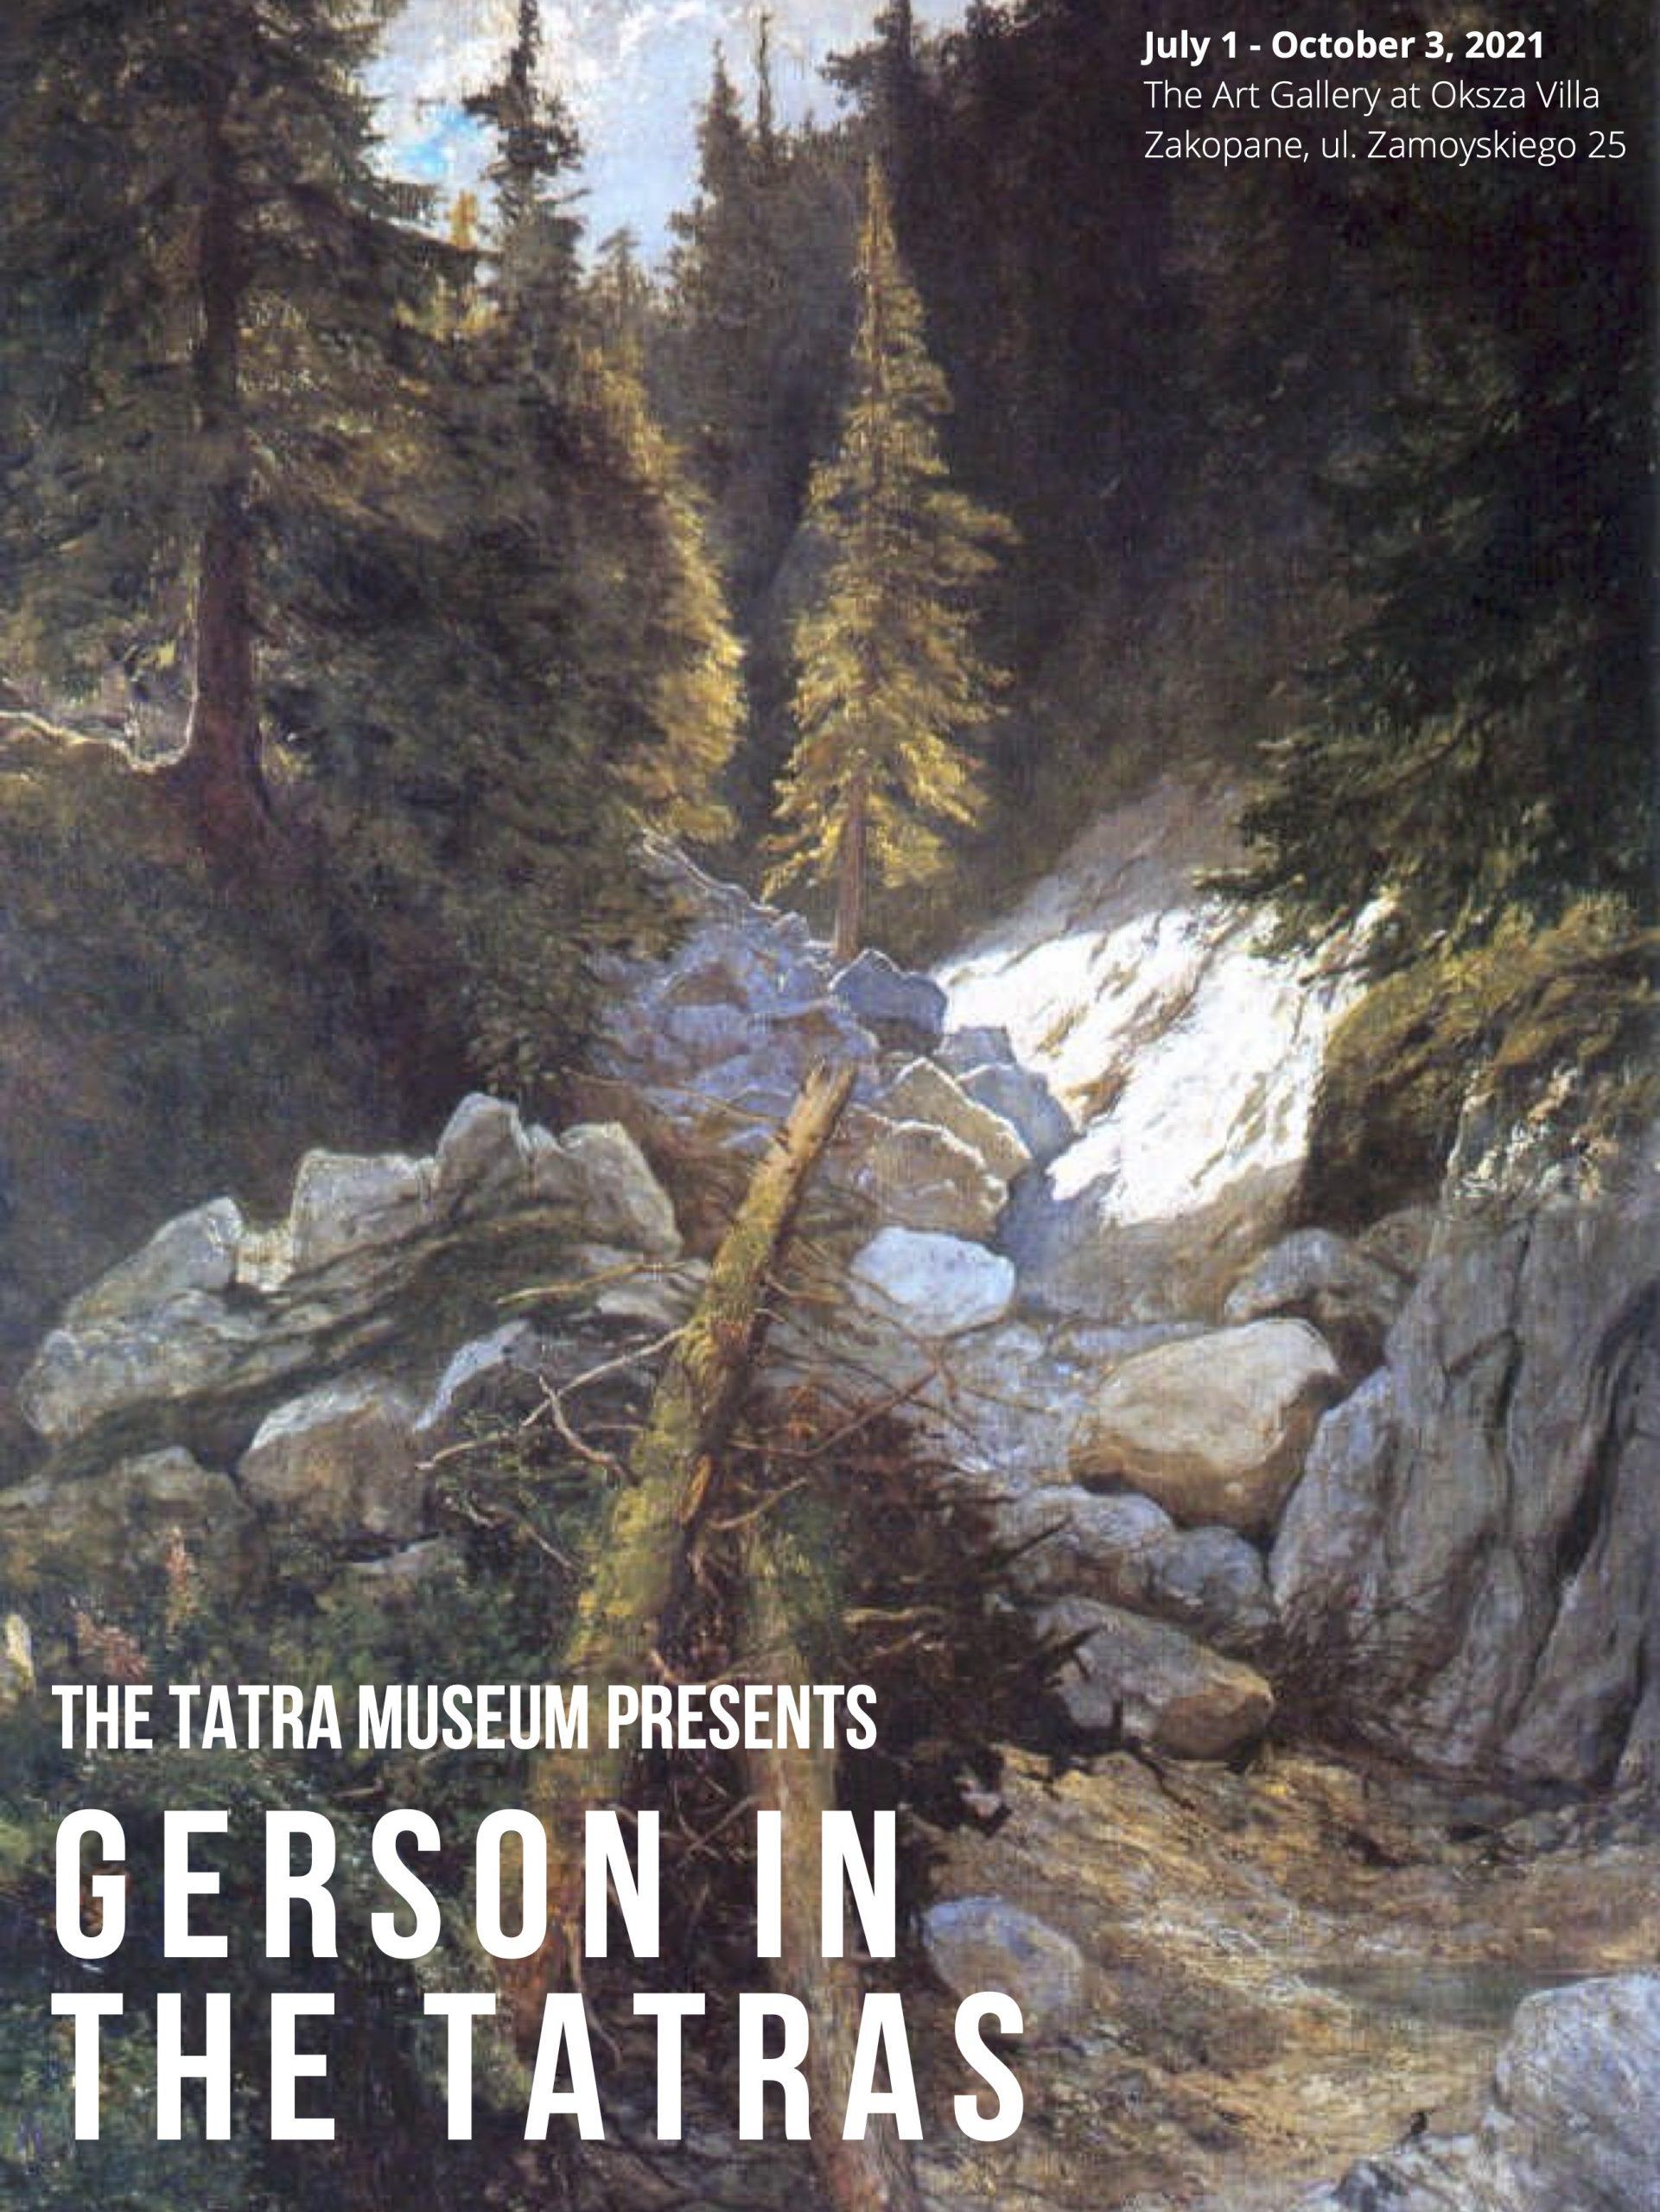 The Tatra Museum Presents Gerson in the Tatras